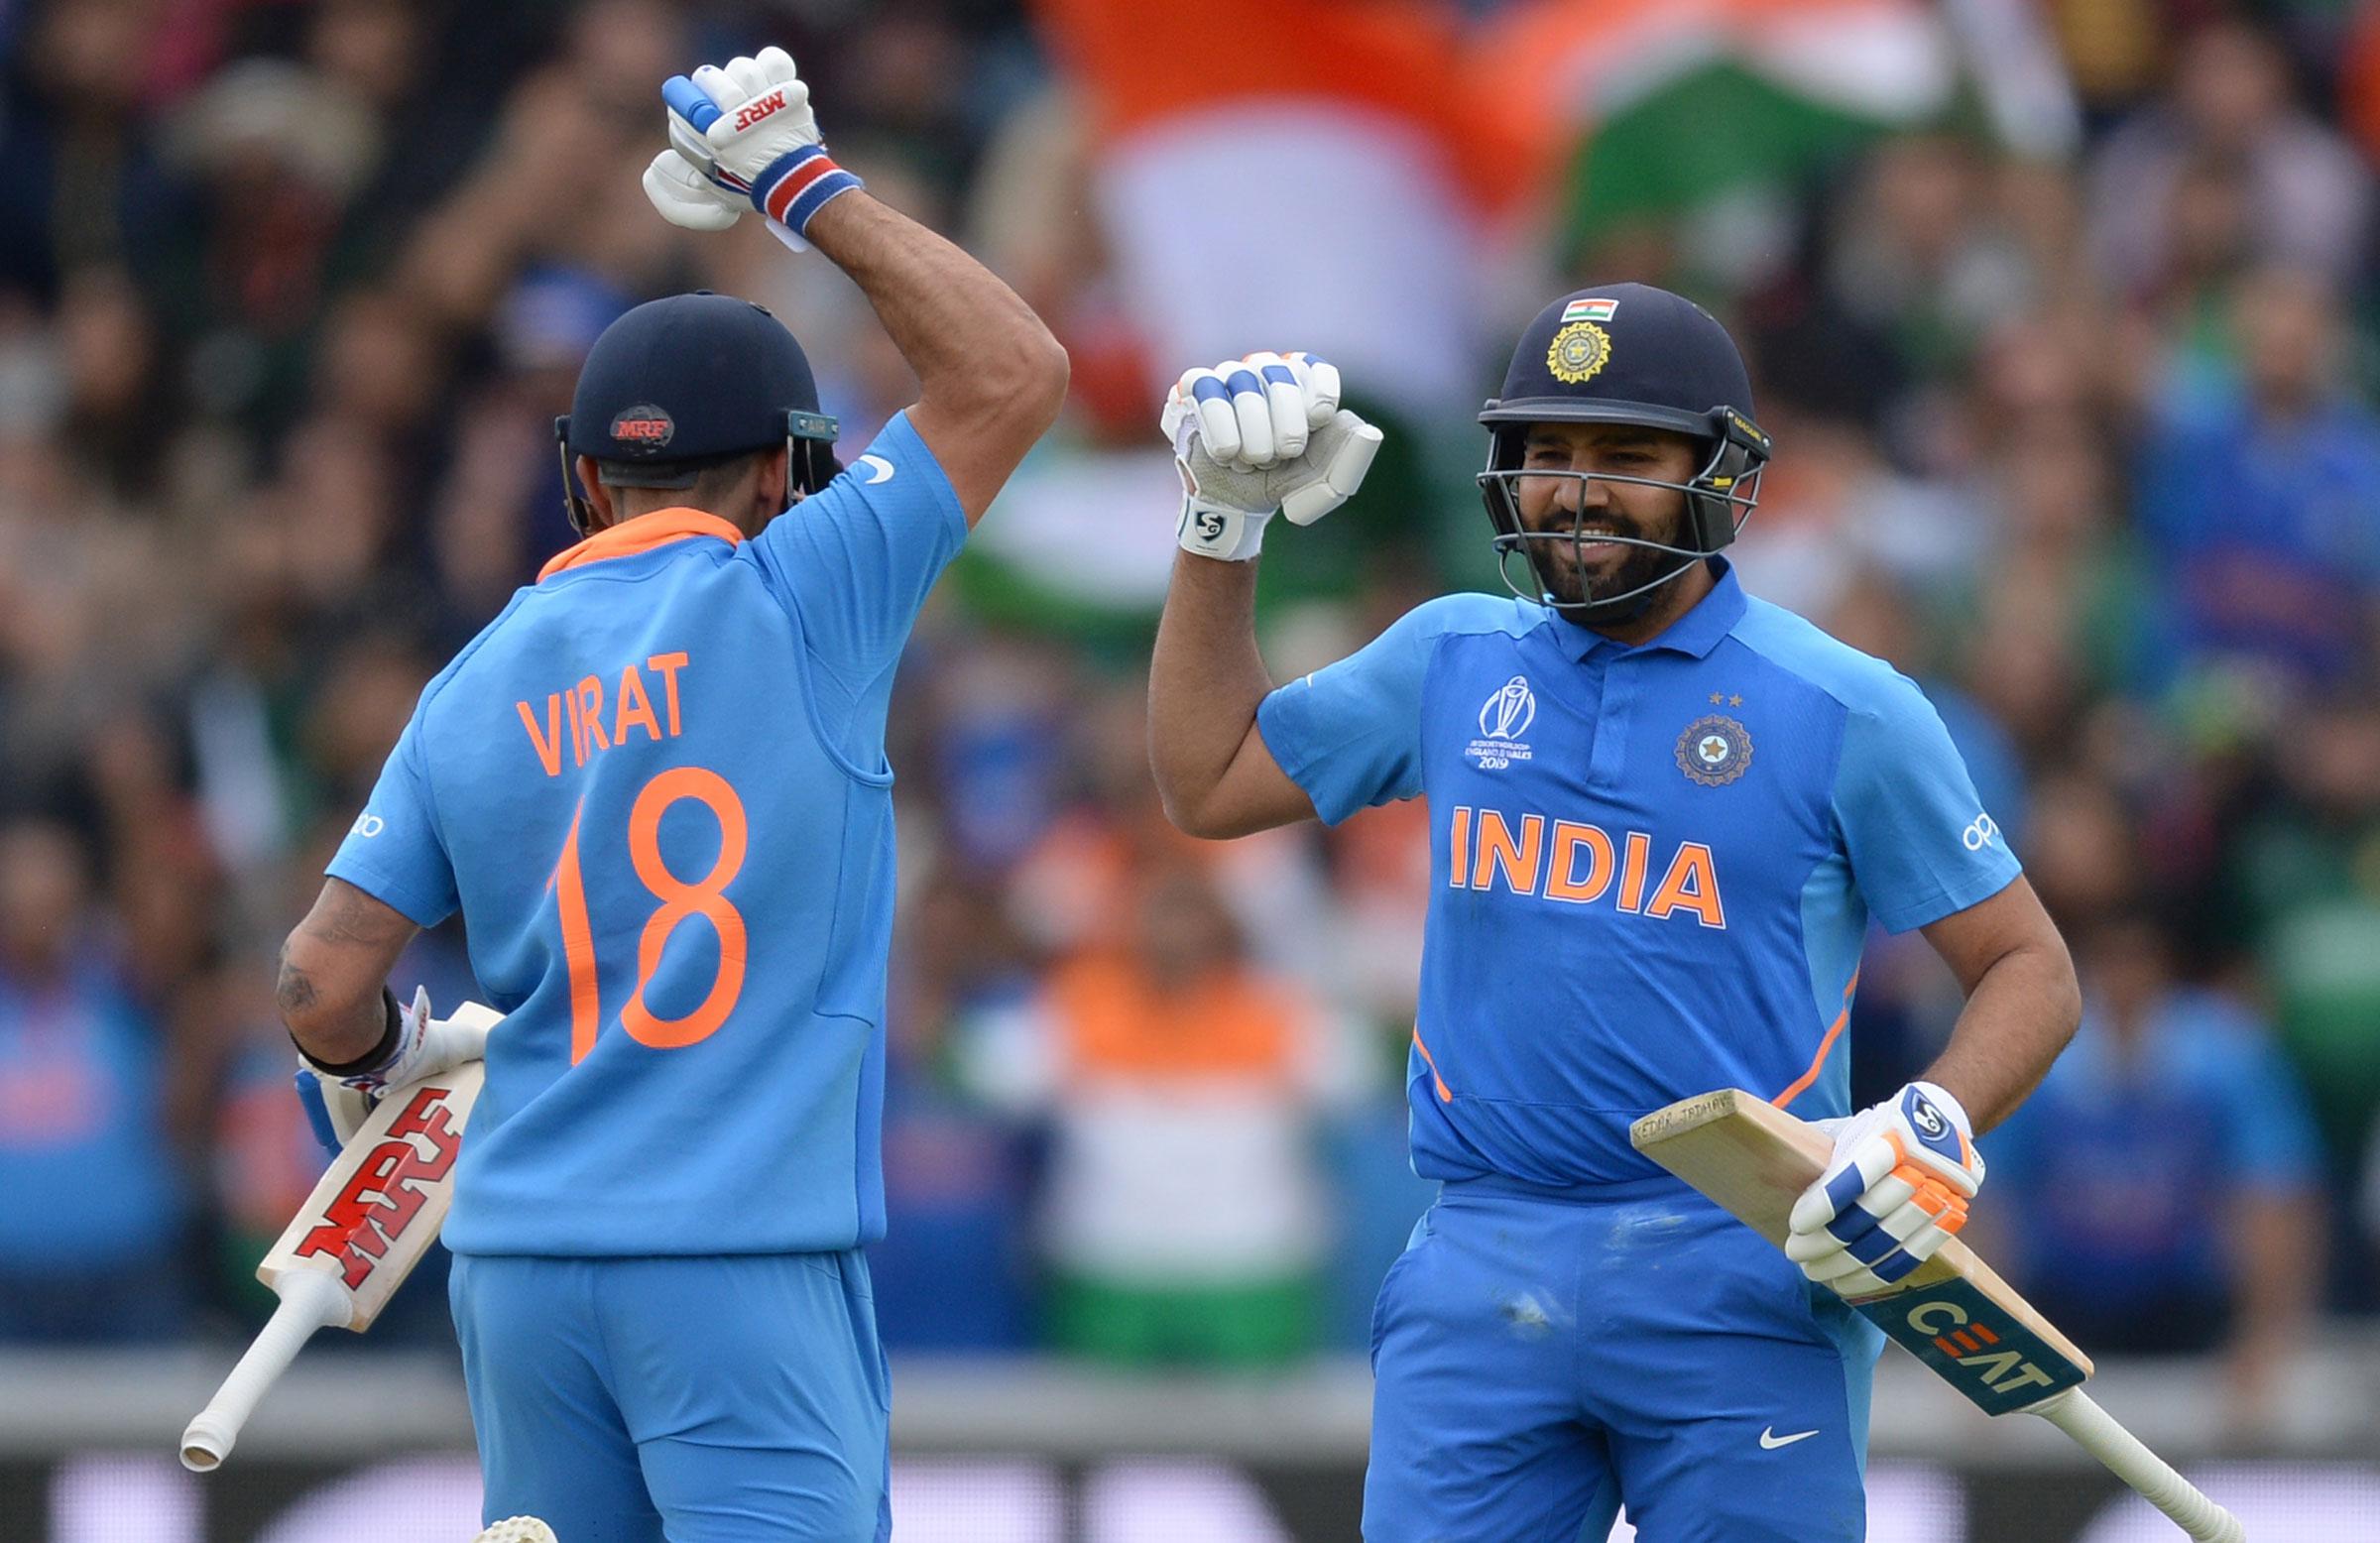 Rohit Sharma struck a match-winning 140 // Getty